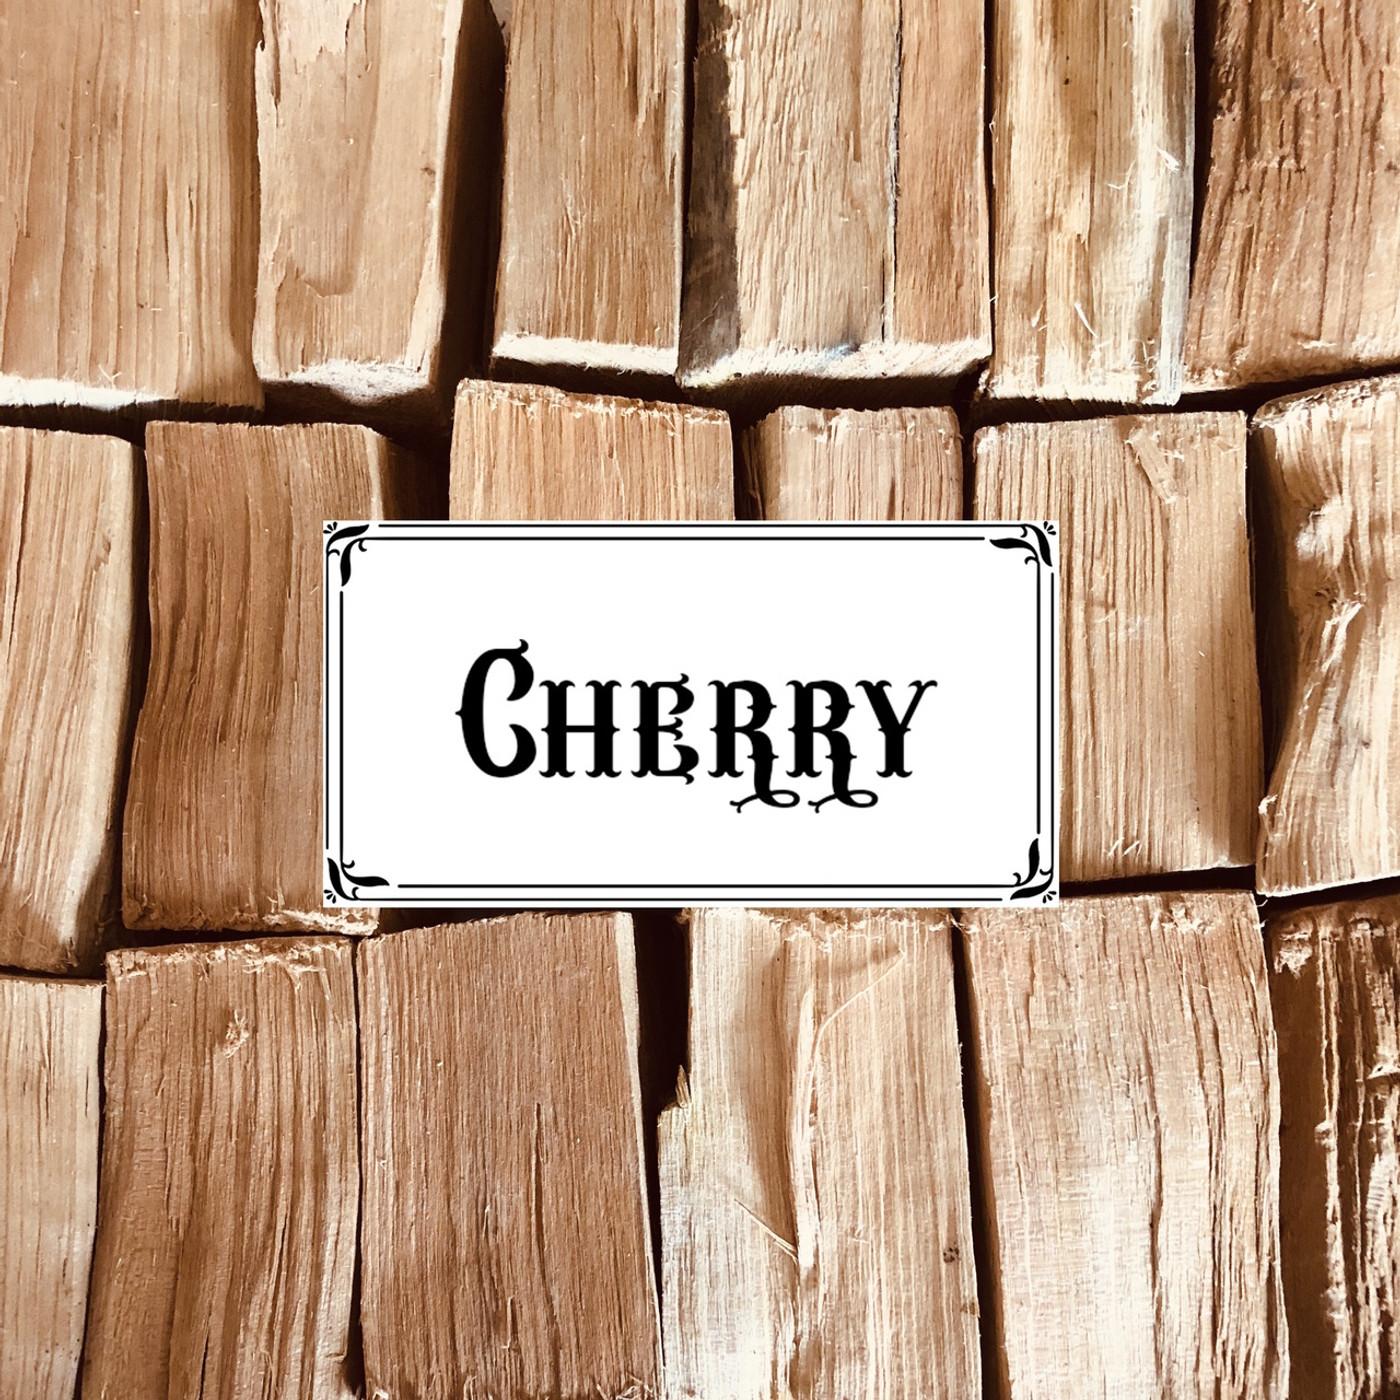 USA Cherry Wood Chunks